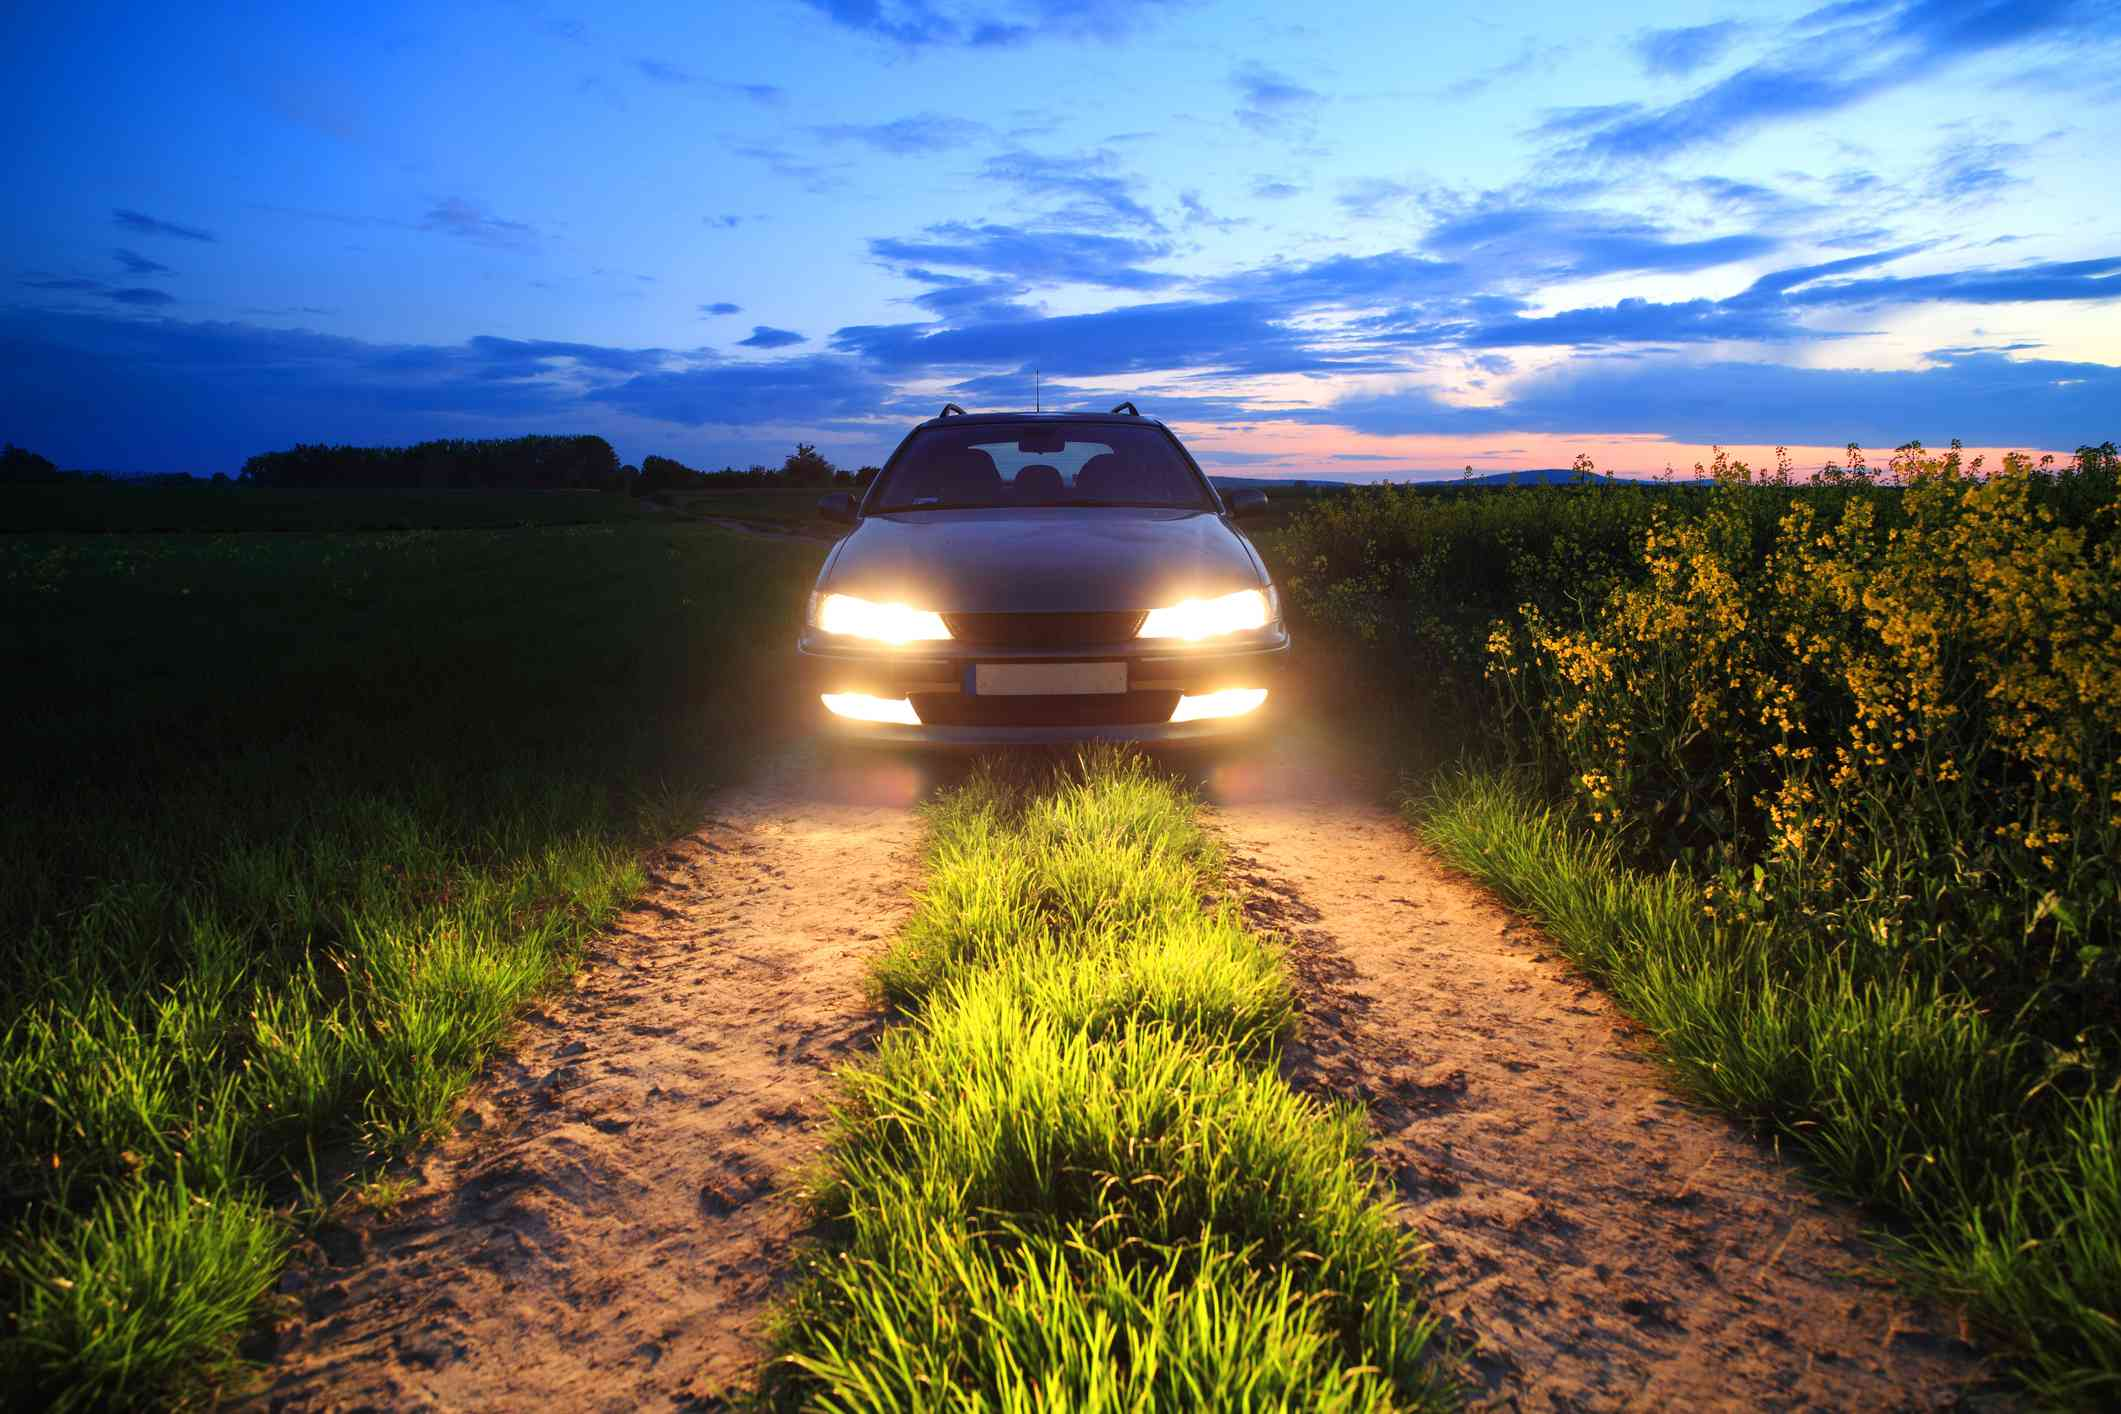 Headlights on a car in a field